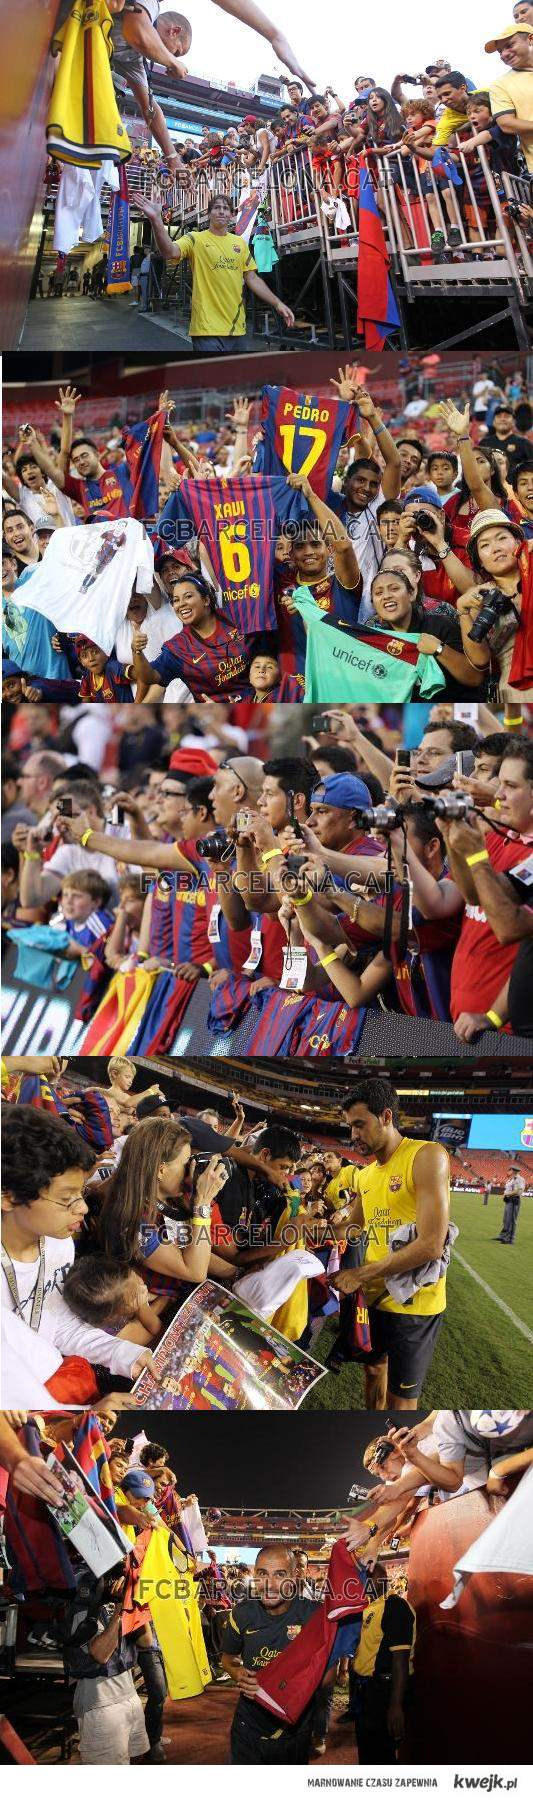 Fani barcelony